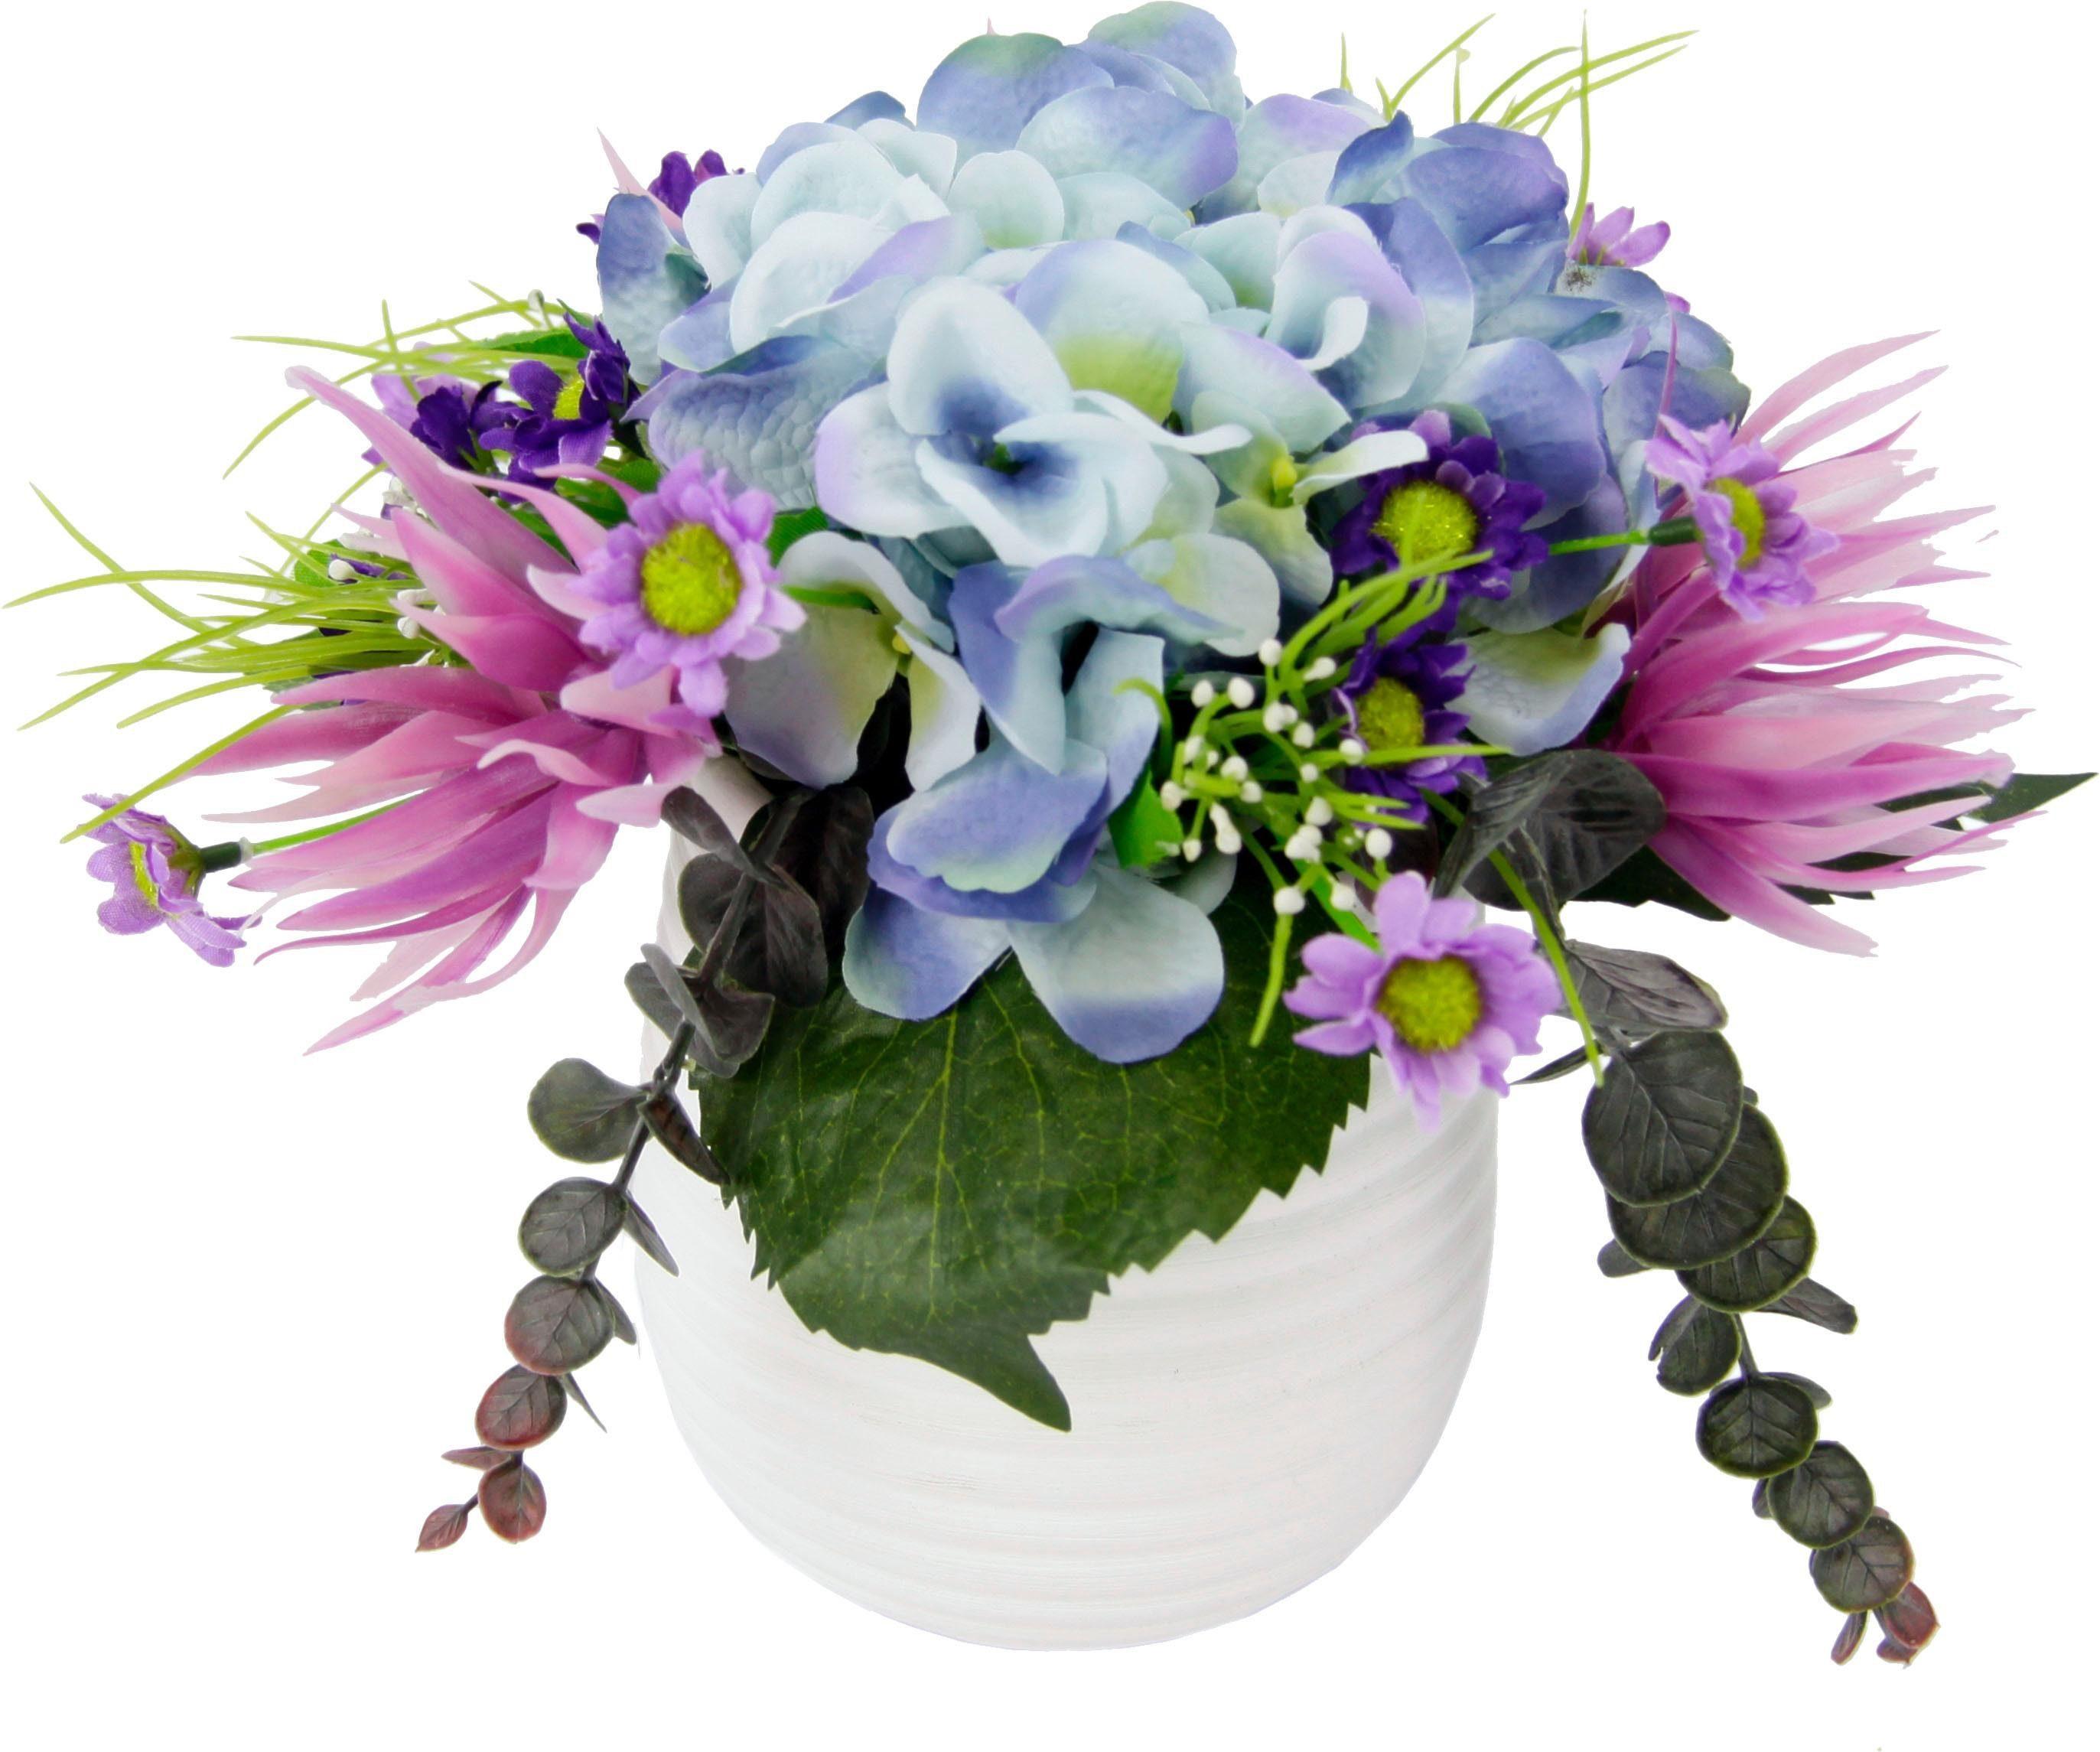 Kunstblume Hortensie im Topf